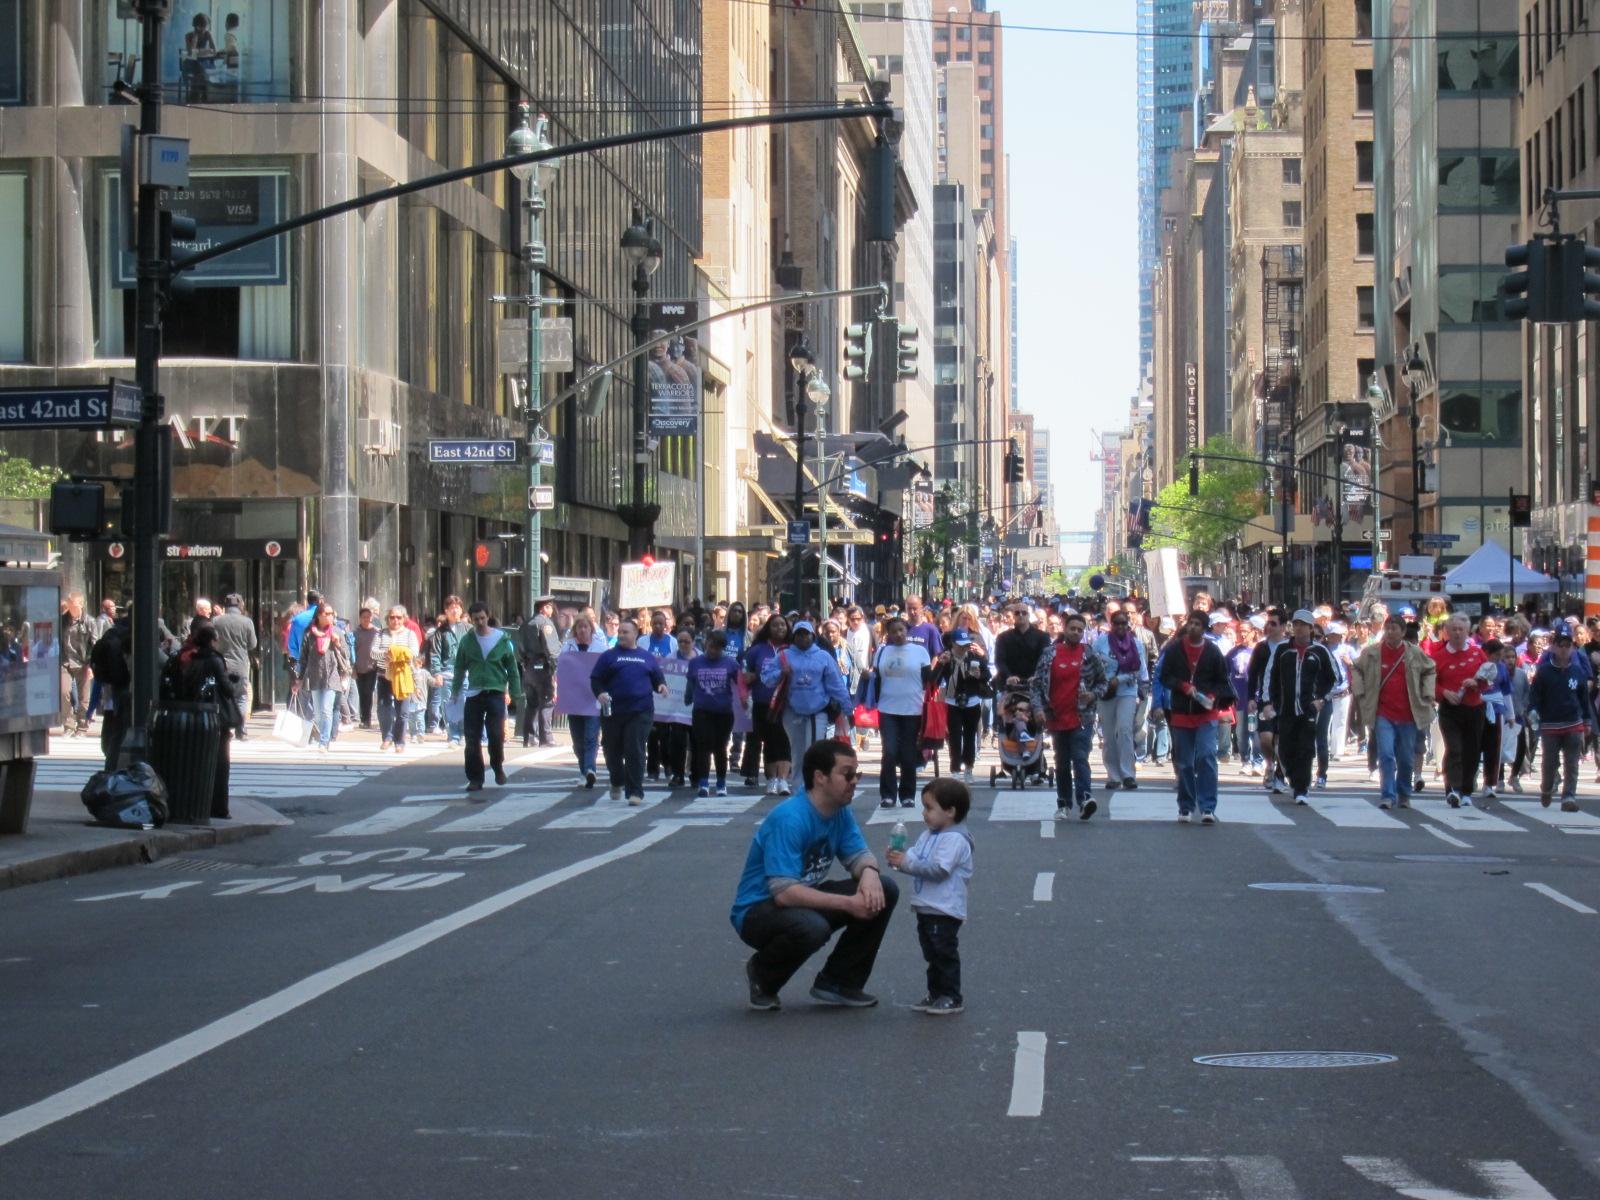 josh--julian-levine-at-the-2012-march-for-babies-walk_8540260090_o.jpg